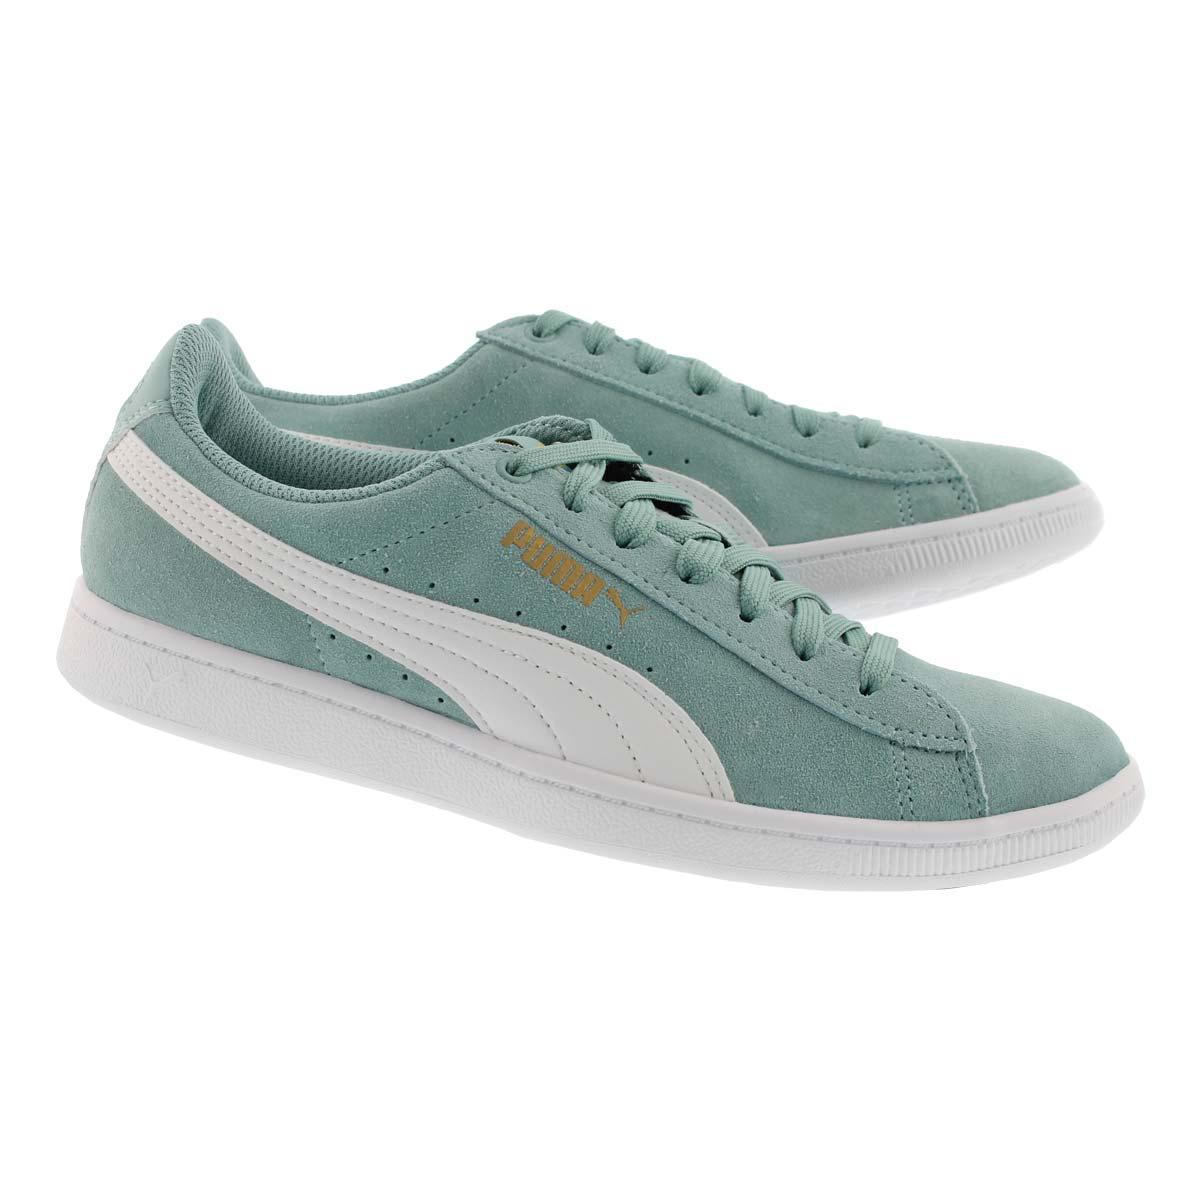 Lds Puma Vikky aquifer sneaker